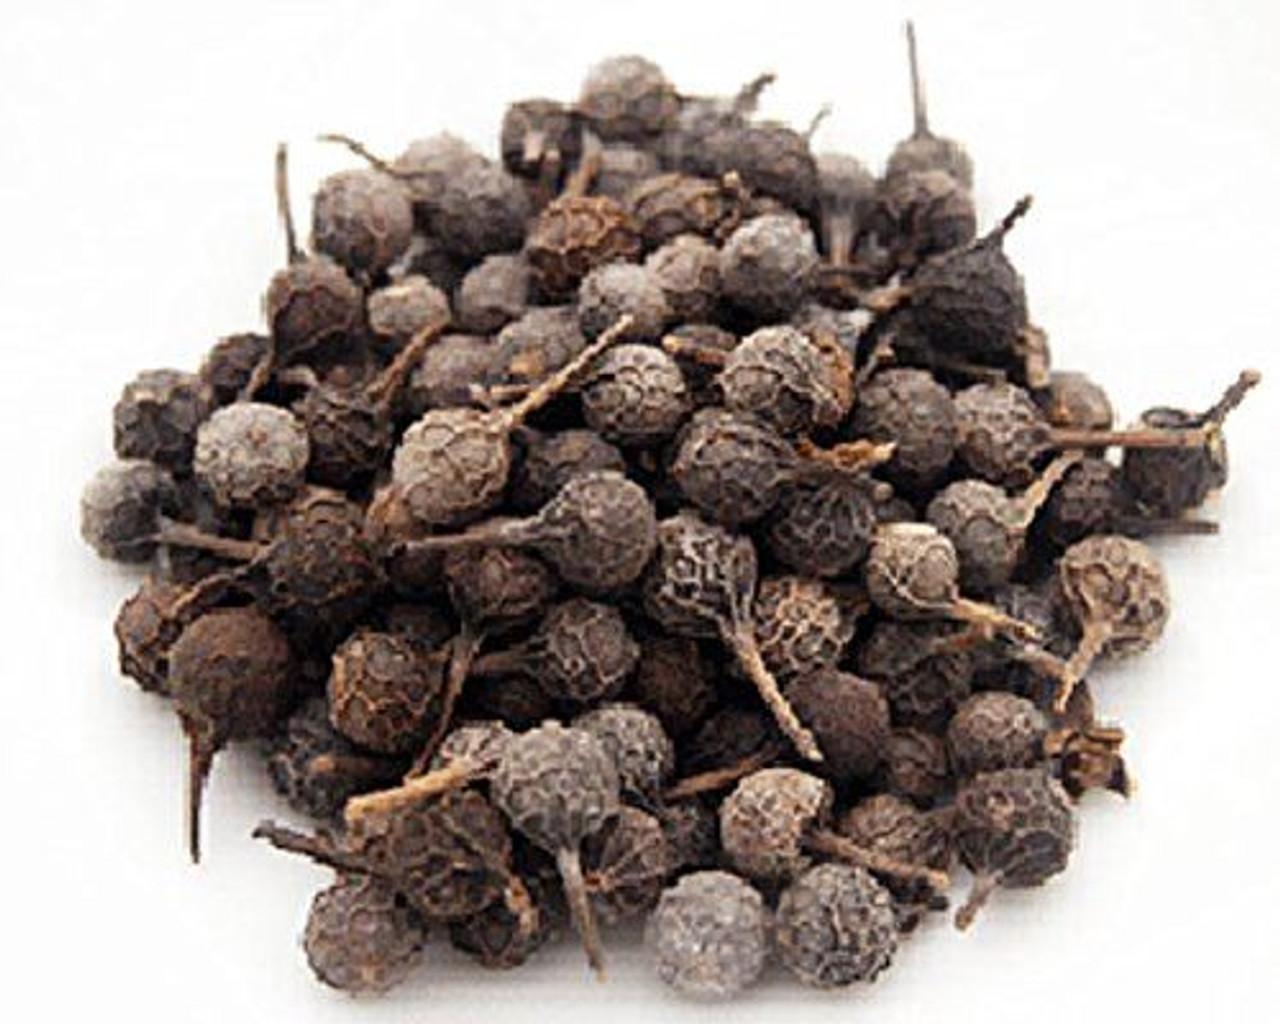 Jalpur Embelia Ribes (vavding babreng)